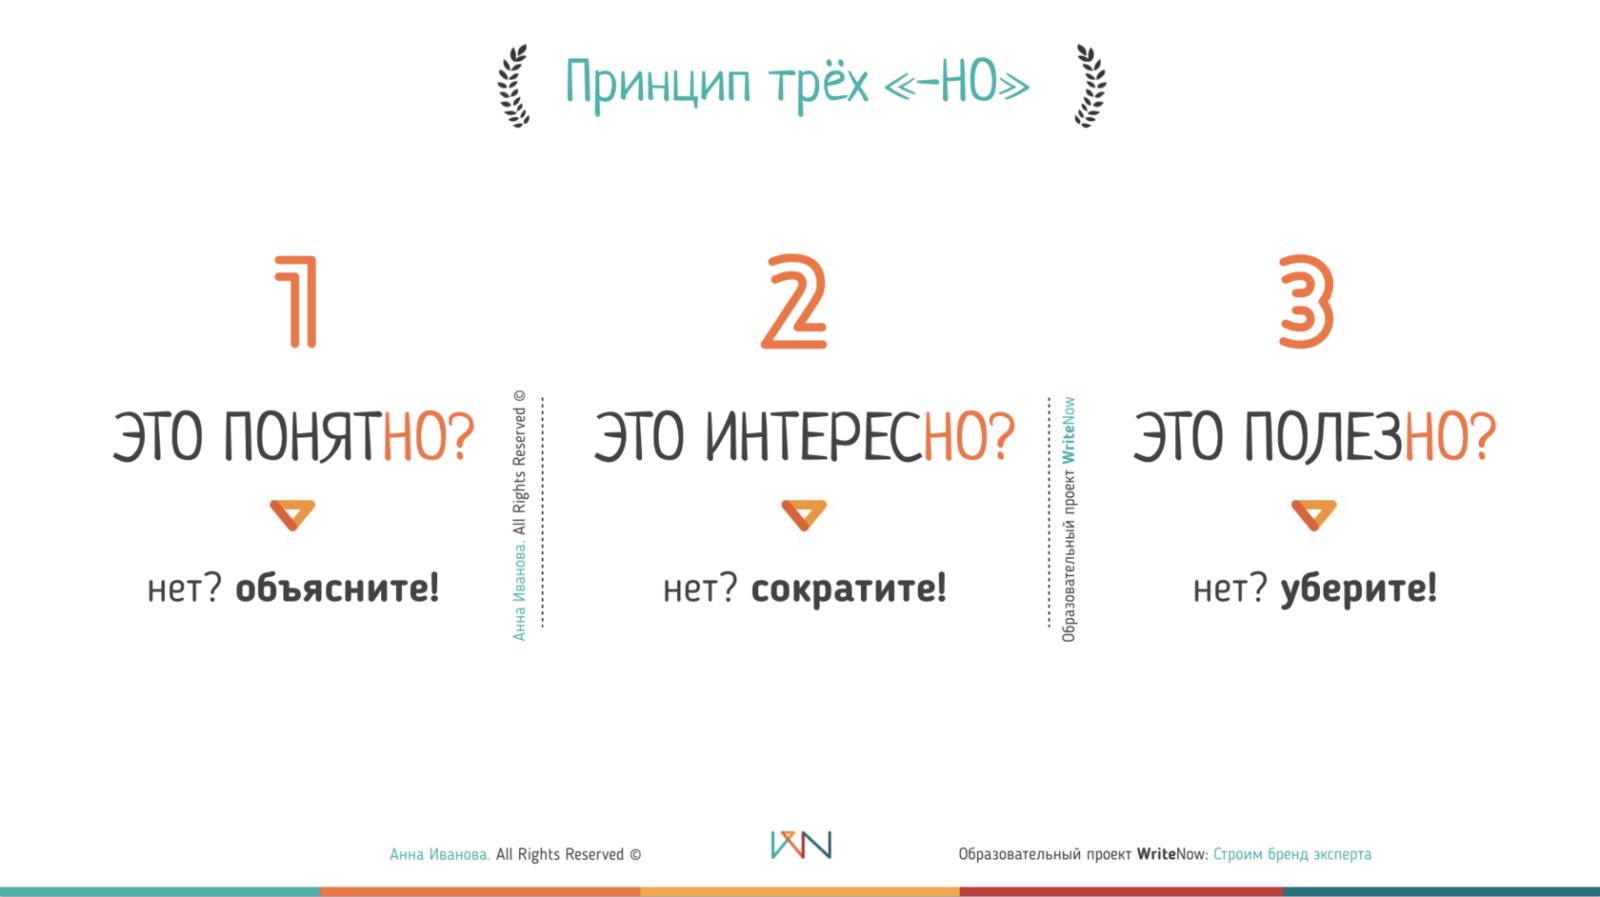 "Принцип трёх ""-но"""